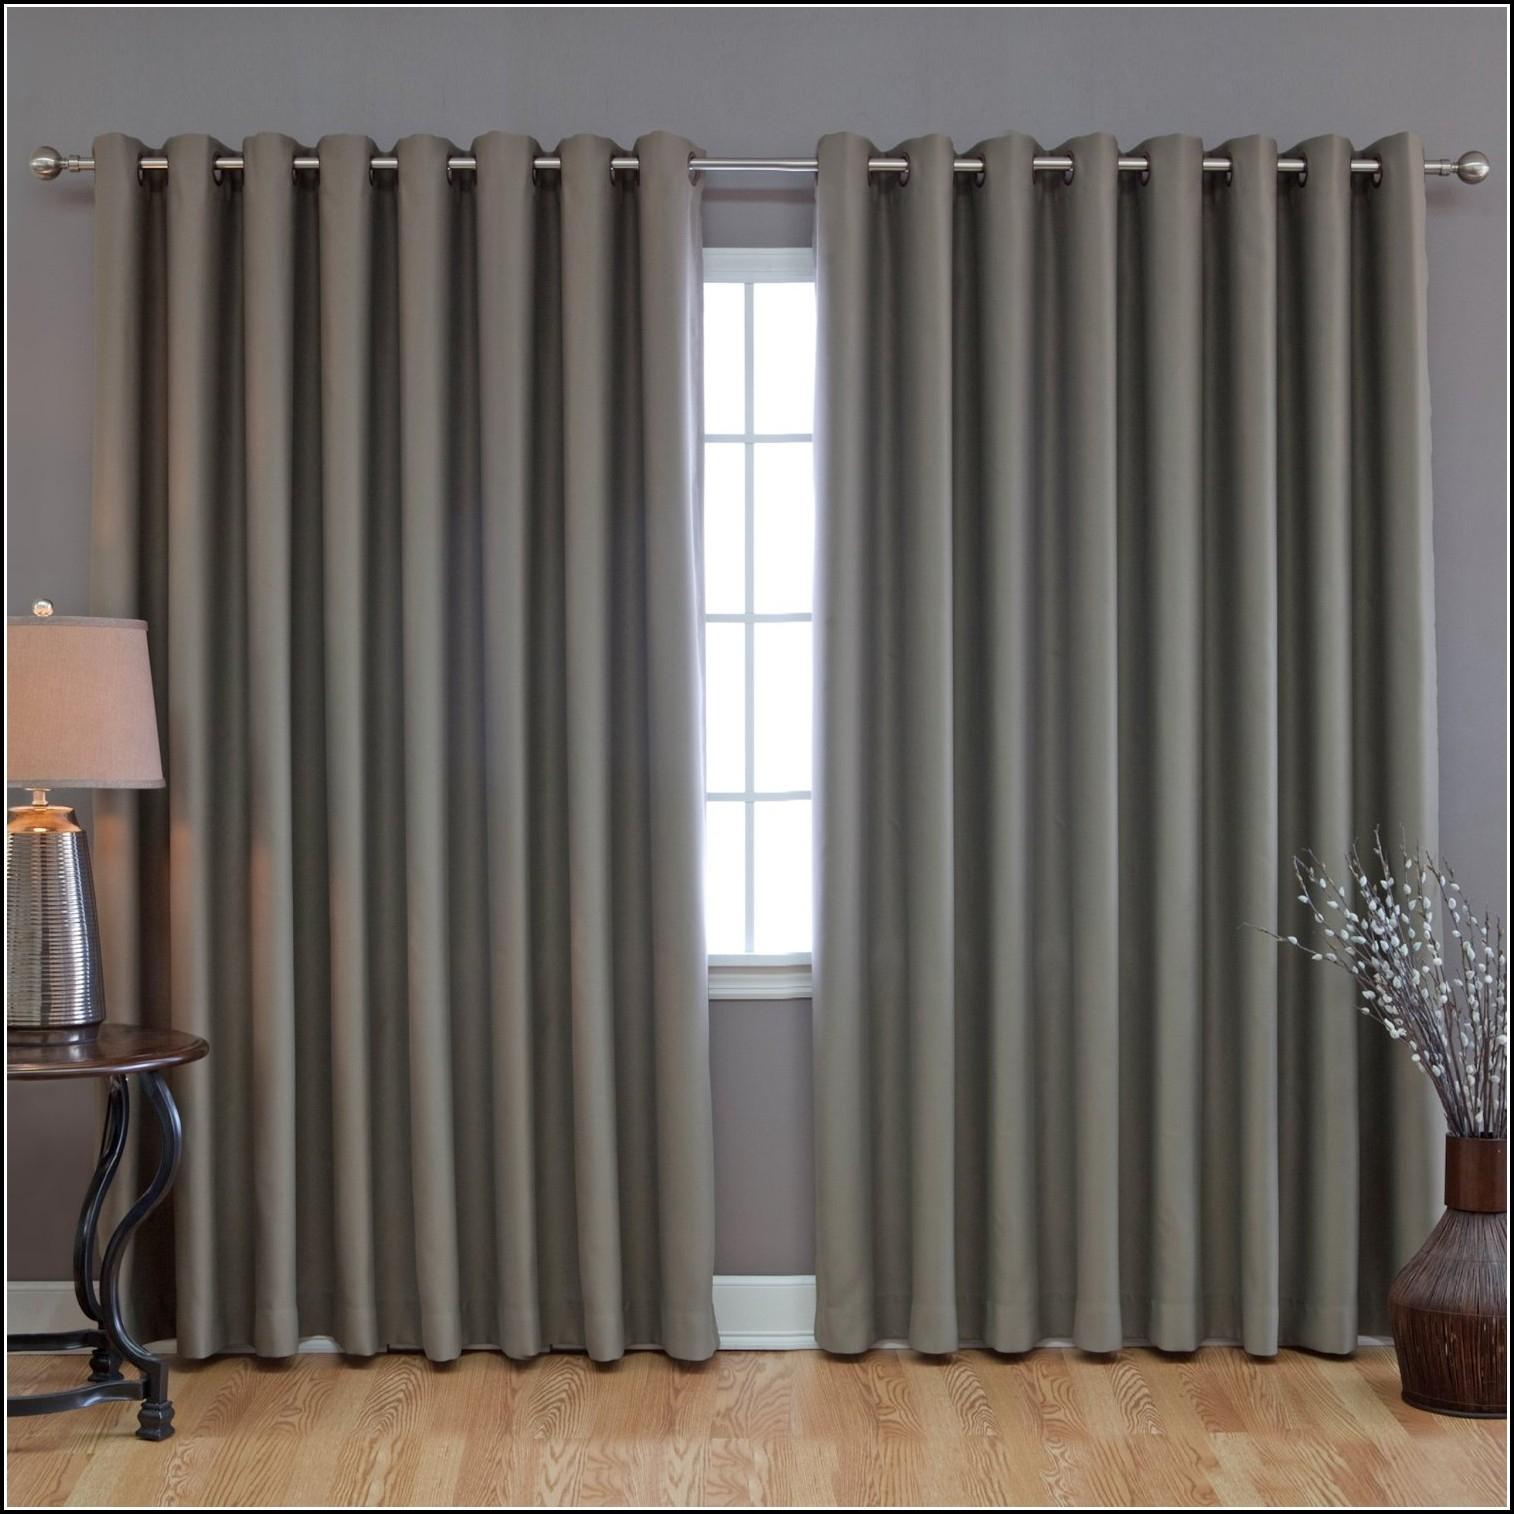 Sliding Door Double Curtain RodSliding Door Double Curtain Rod